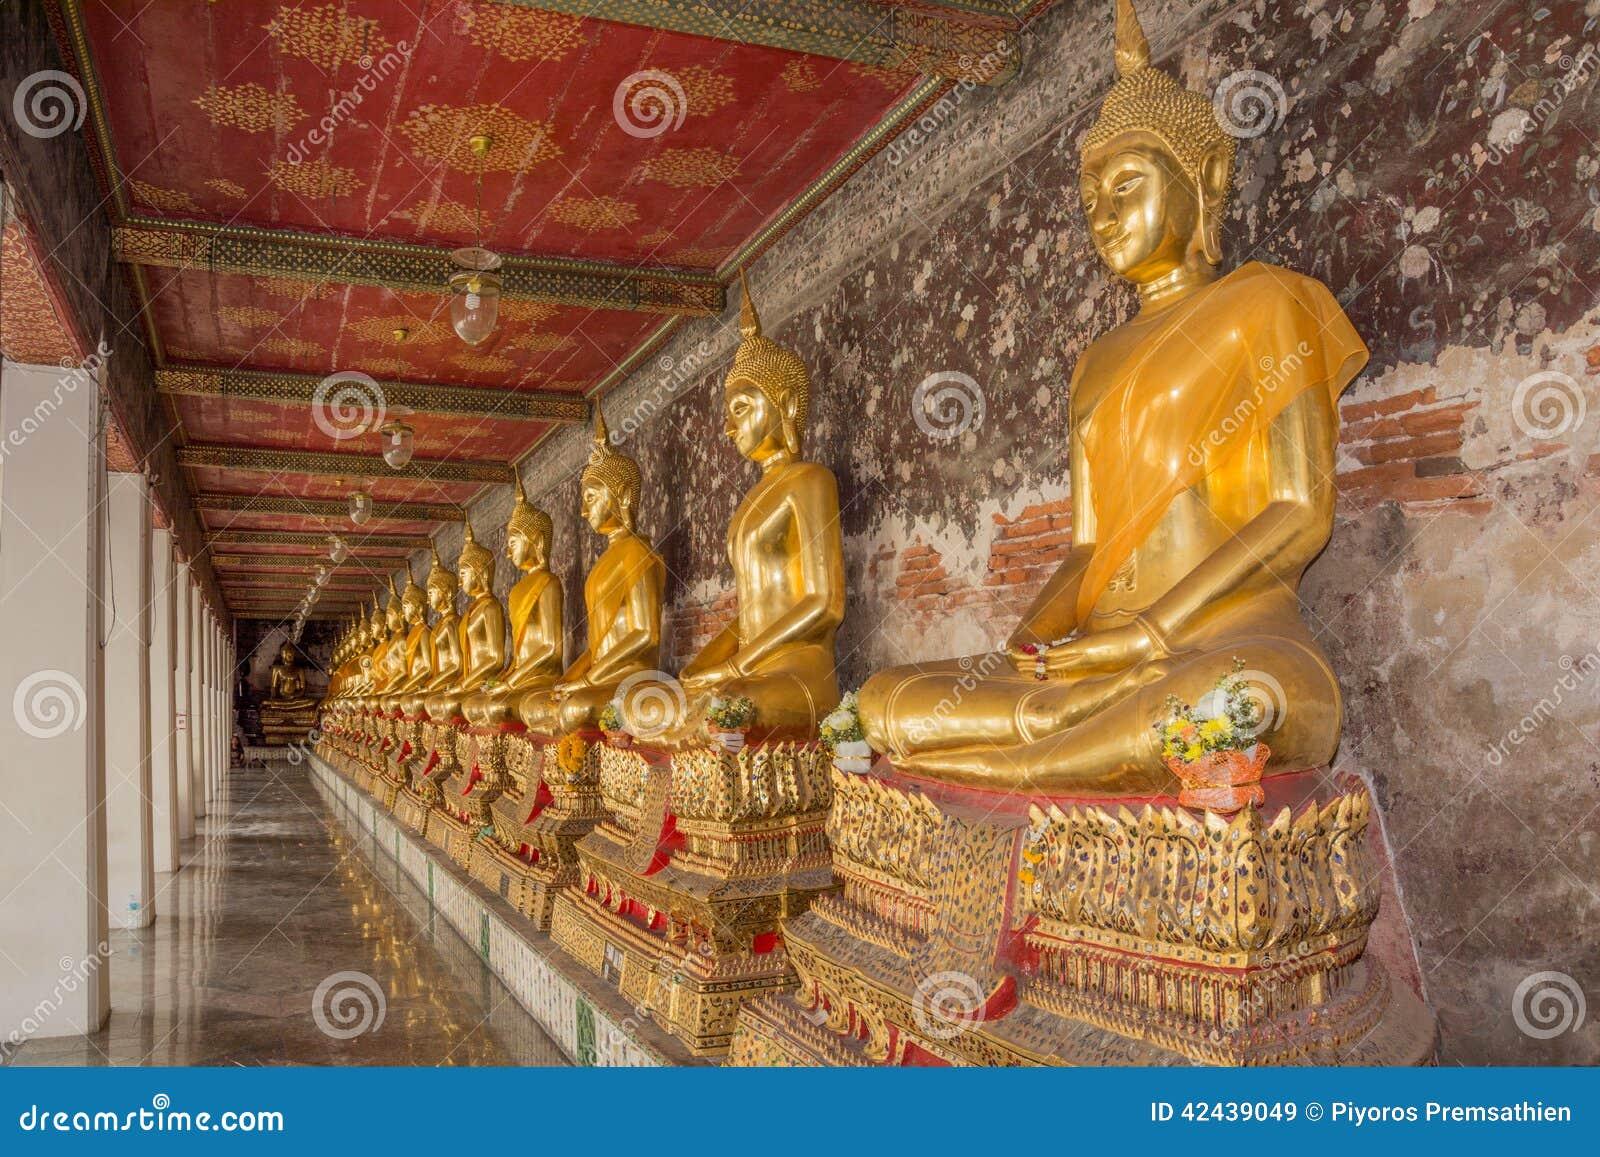 Estatua de oro de Buda en Tailandia